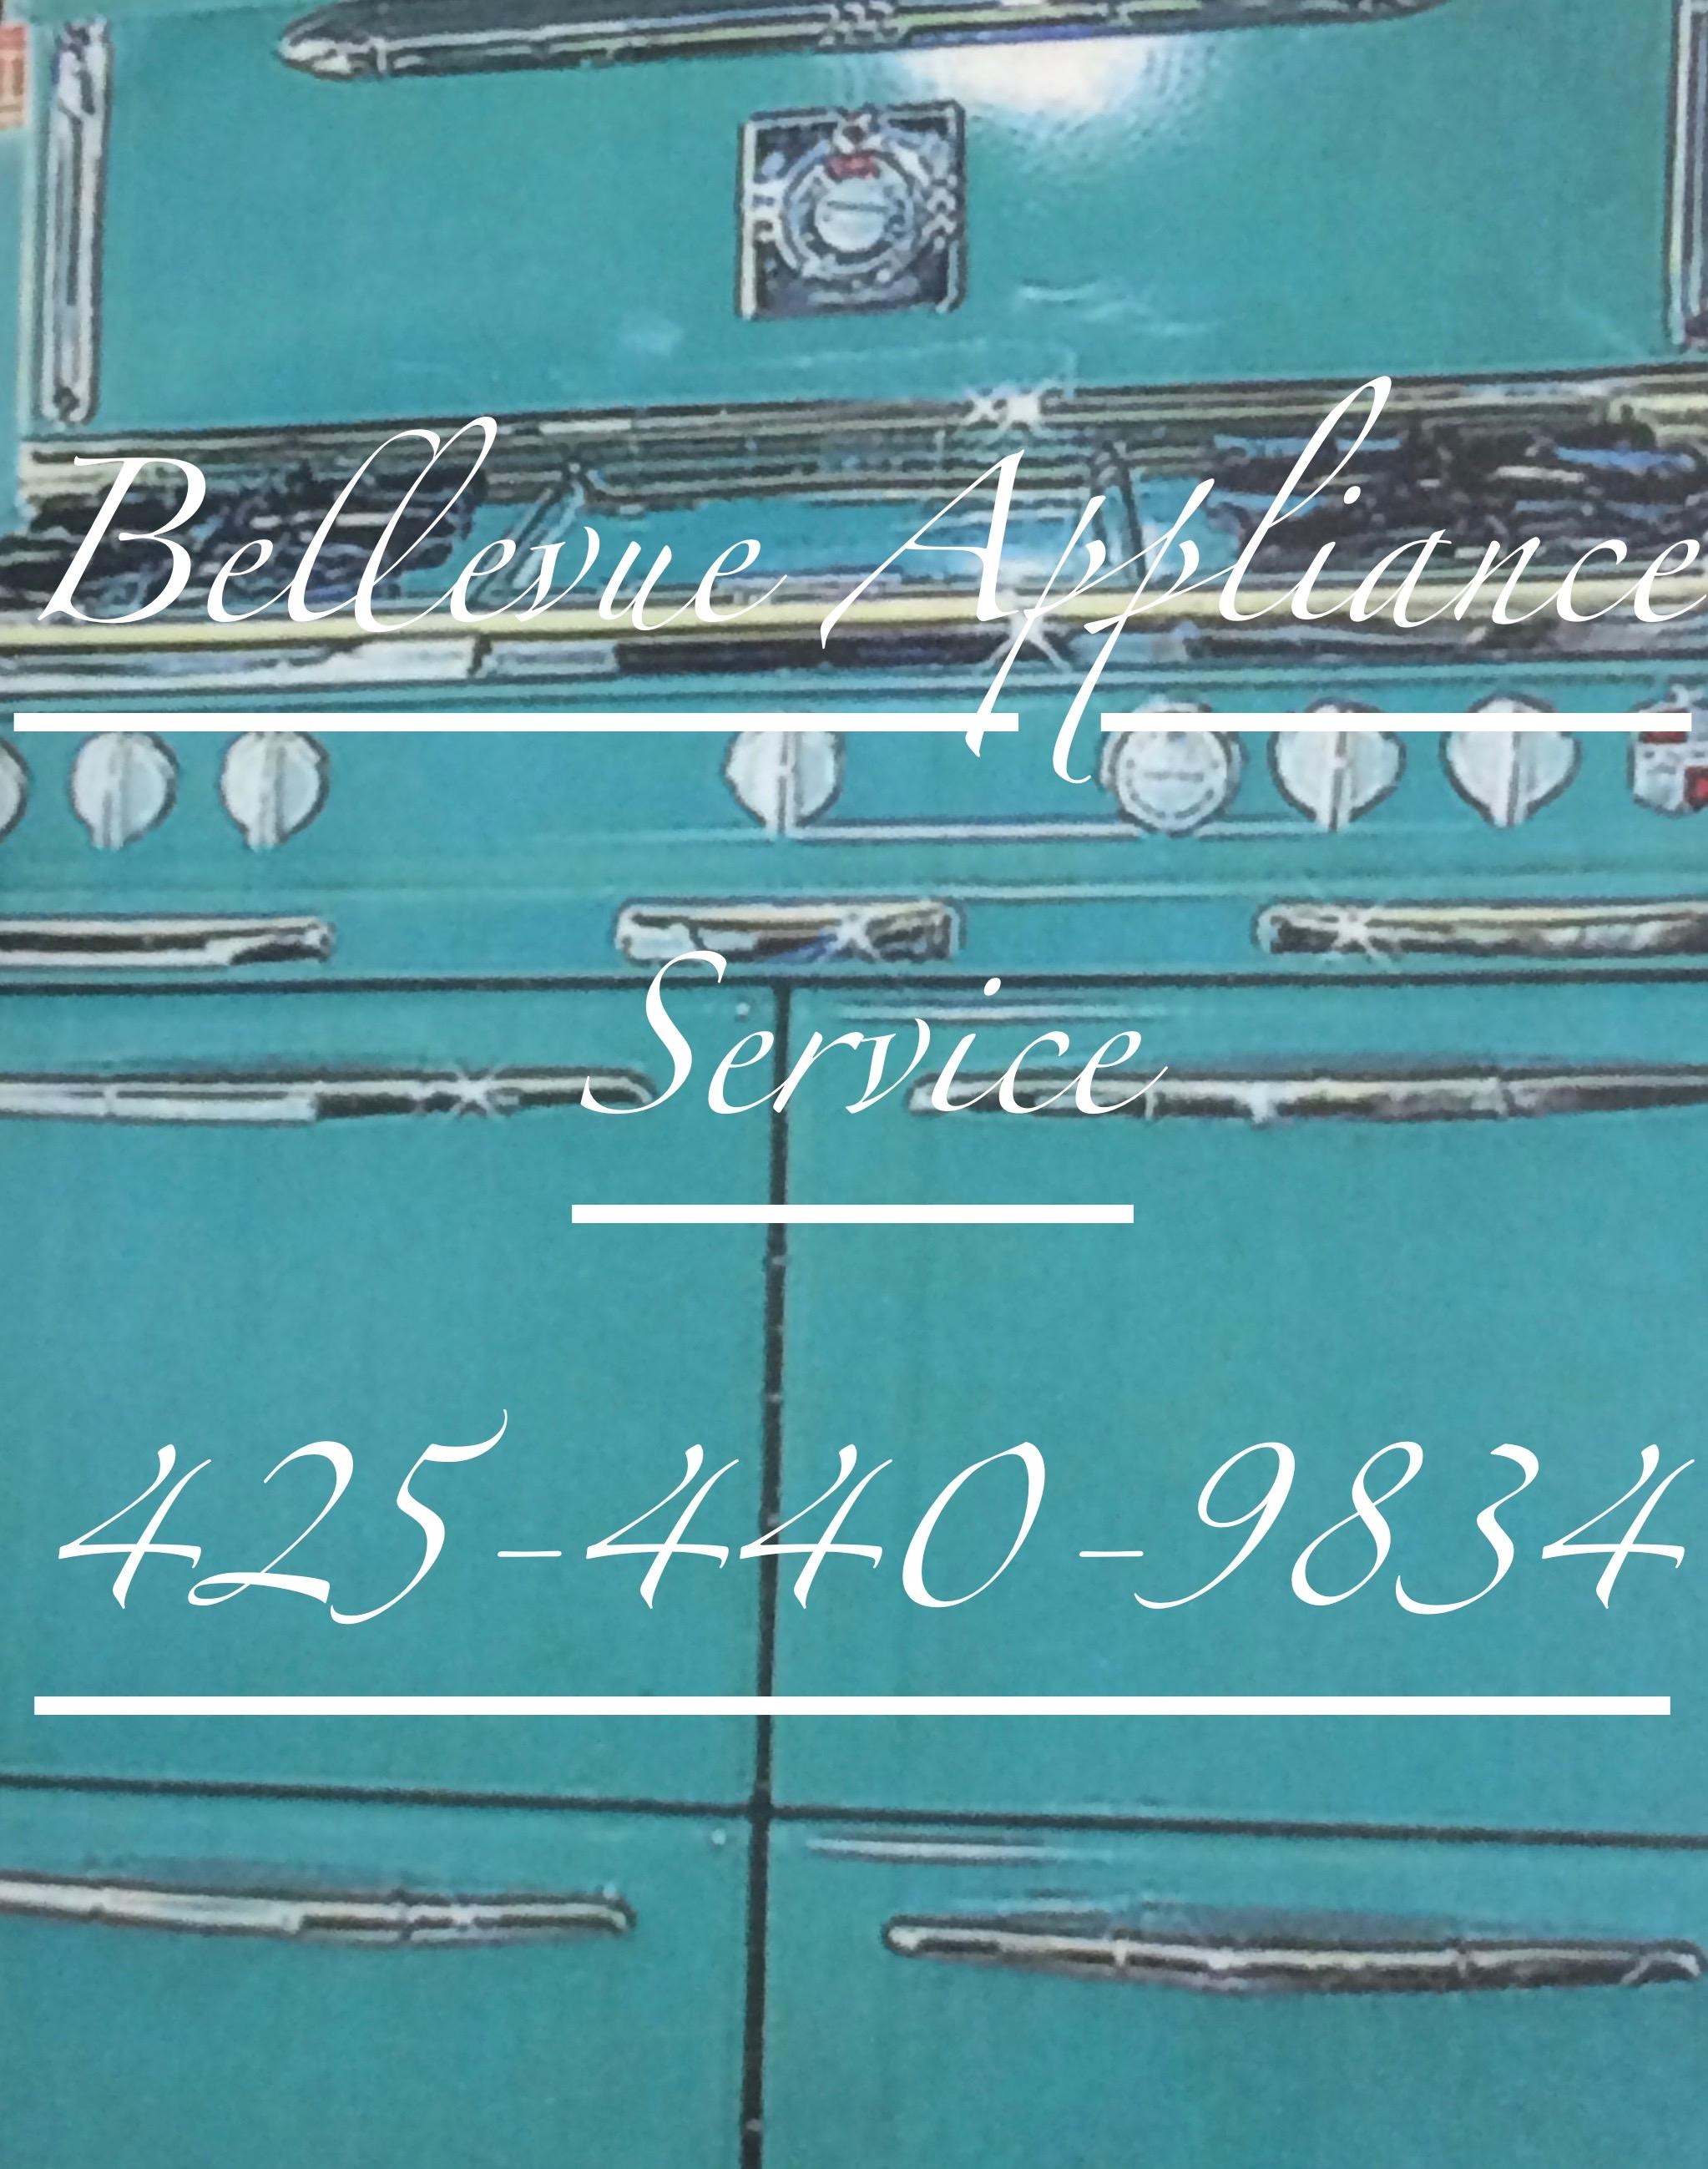 Bellevue Appliance Service image 1